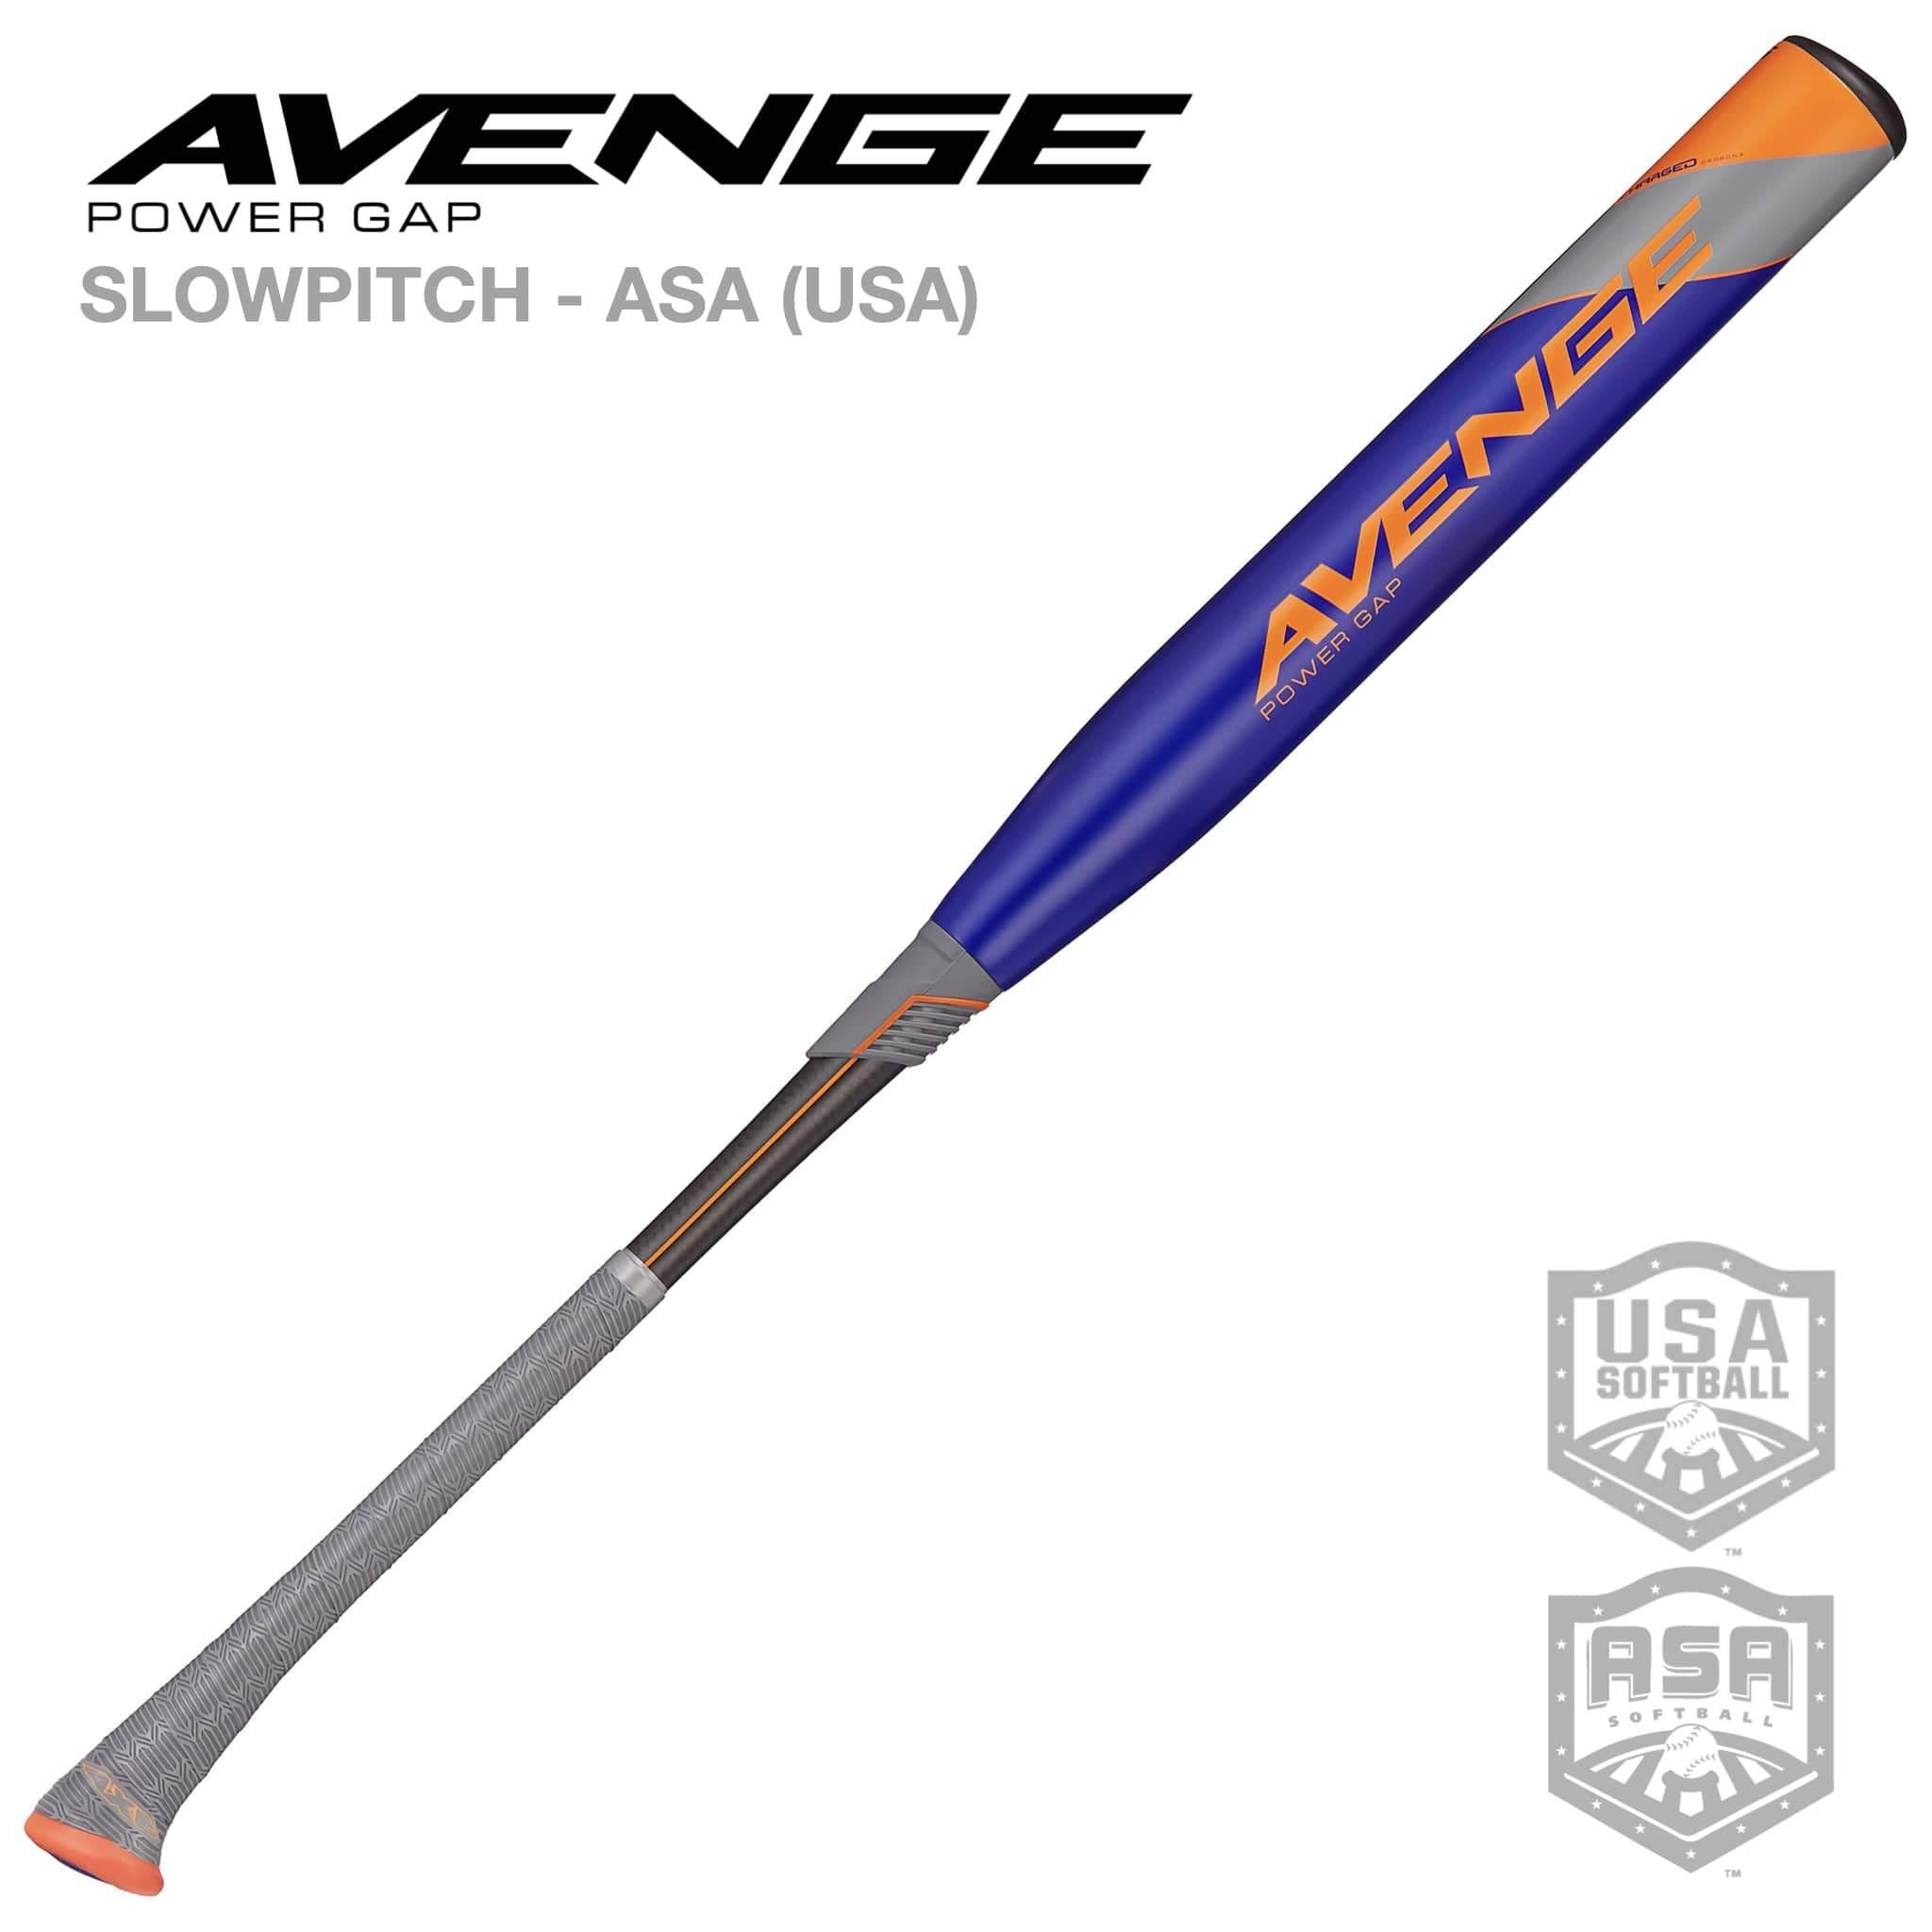 AVENGE POWER GAP ASA (USA) SLOWPITCH SOFTBALL BAT 2021